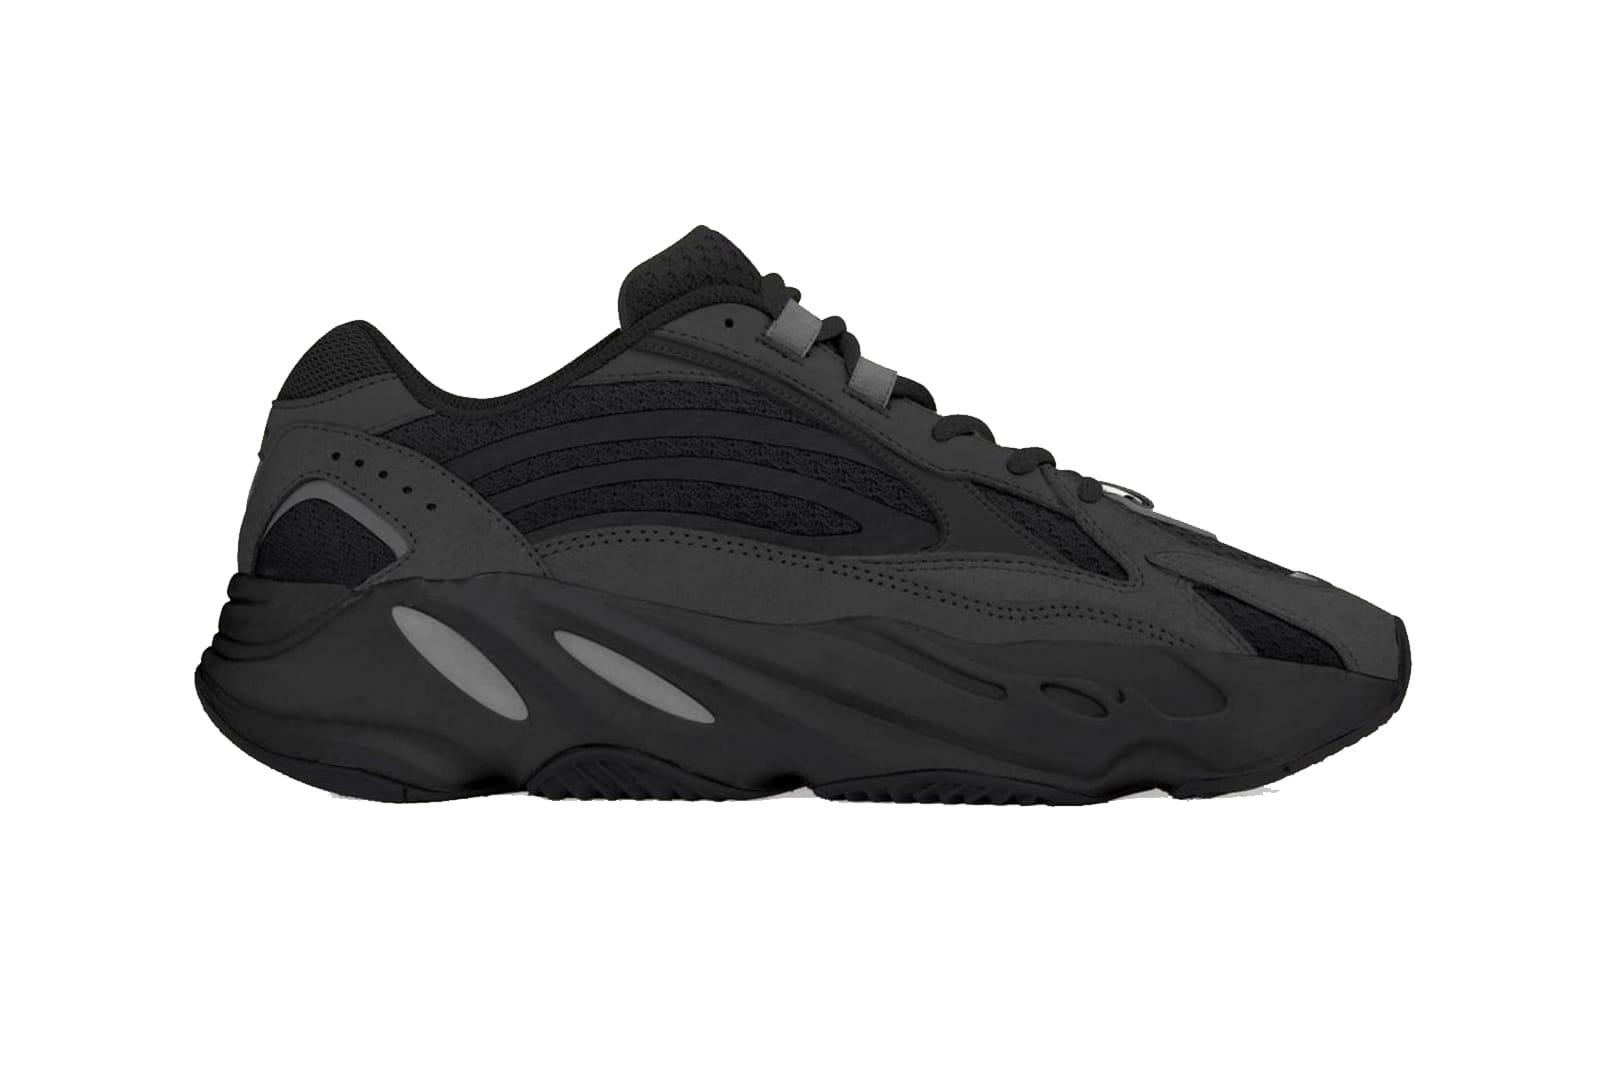 adidas Yeezy Boost 700 V2 Vanta Teaser